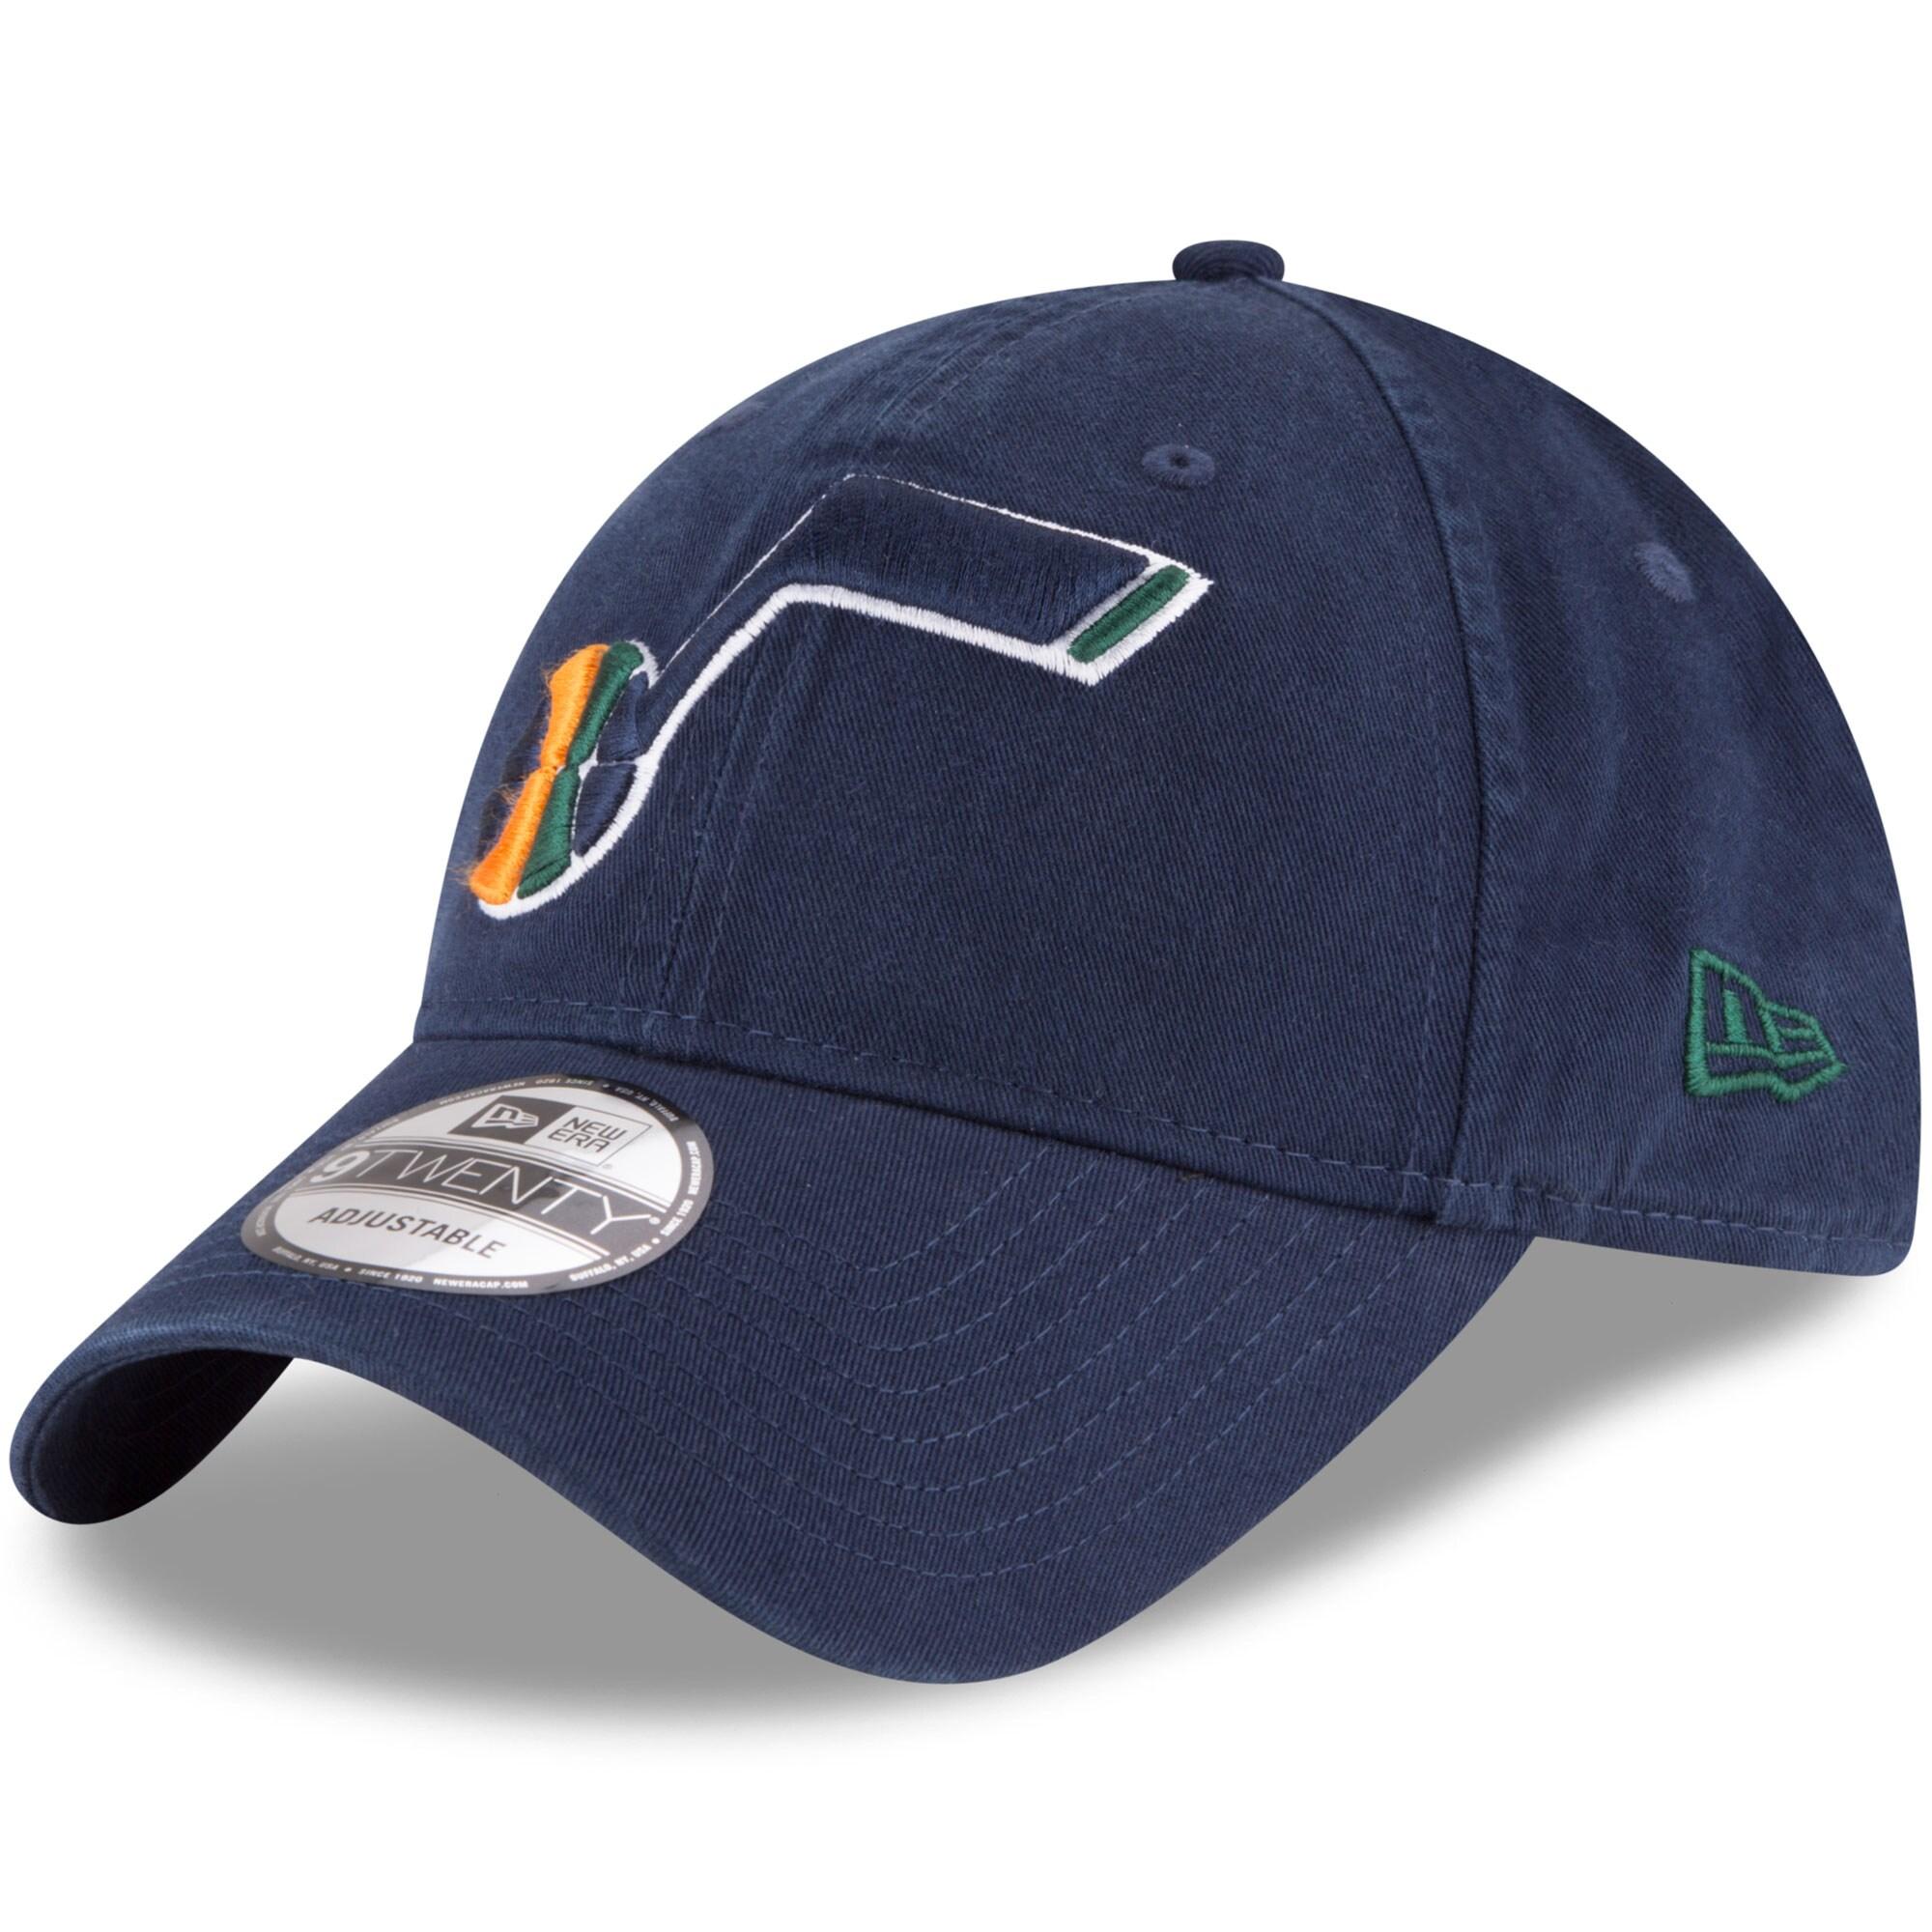 Utah Jazz New Era Official Team Color 9TWENTY Adjustable Hat - Navy